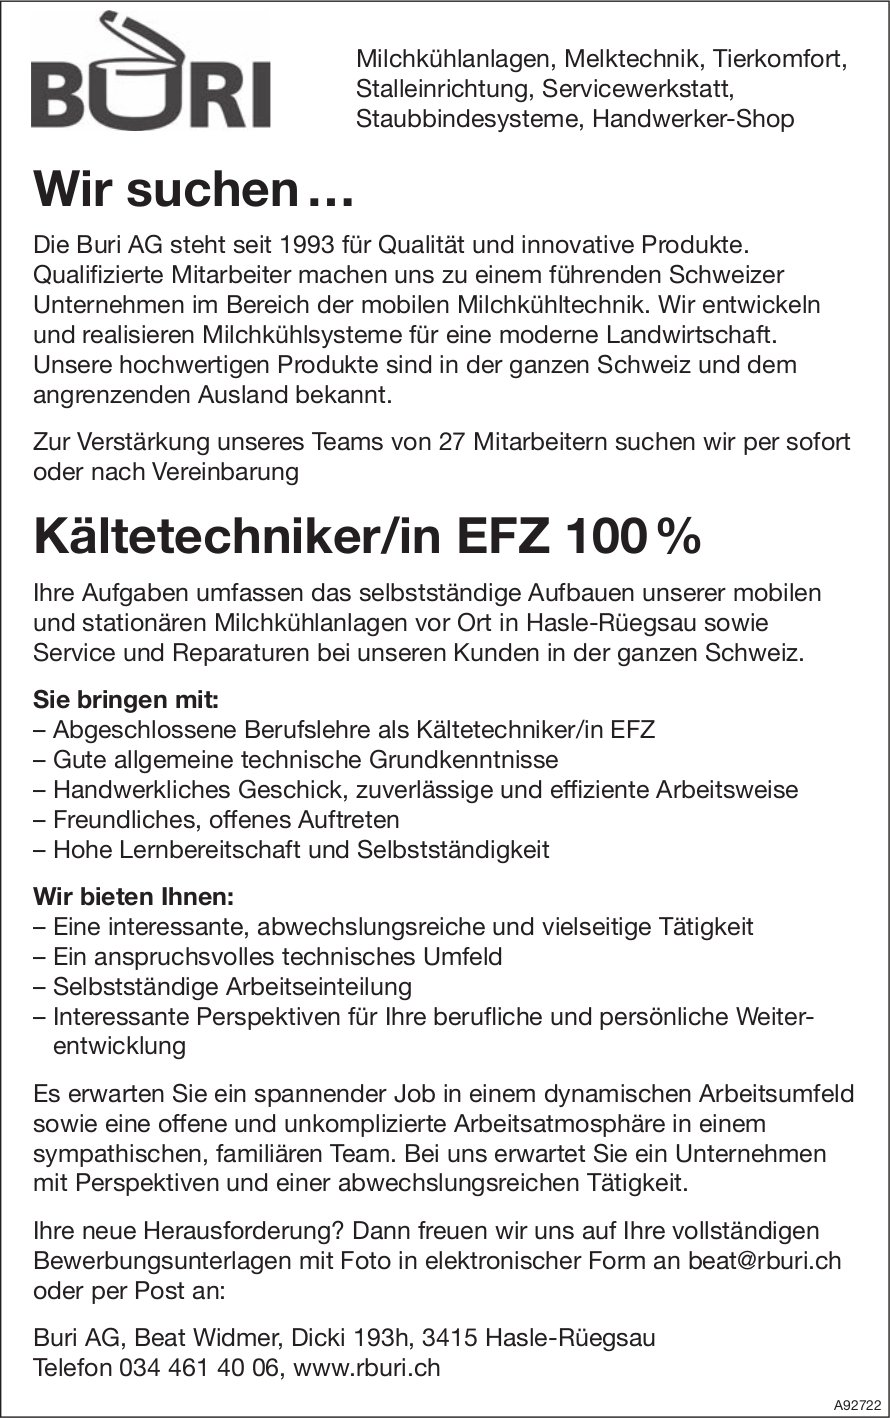 Kältetechniker/in EFZ 100%, Buri AG, Hasle-Rüegsau, gesucht